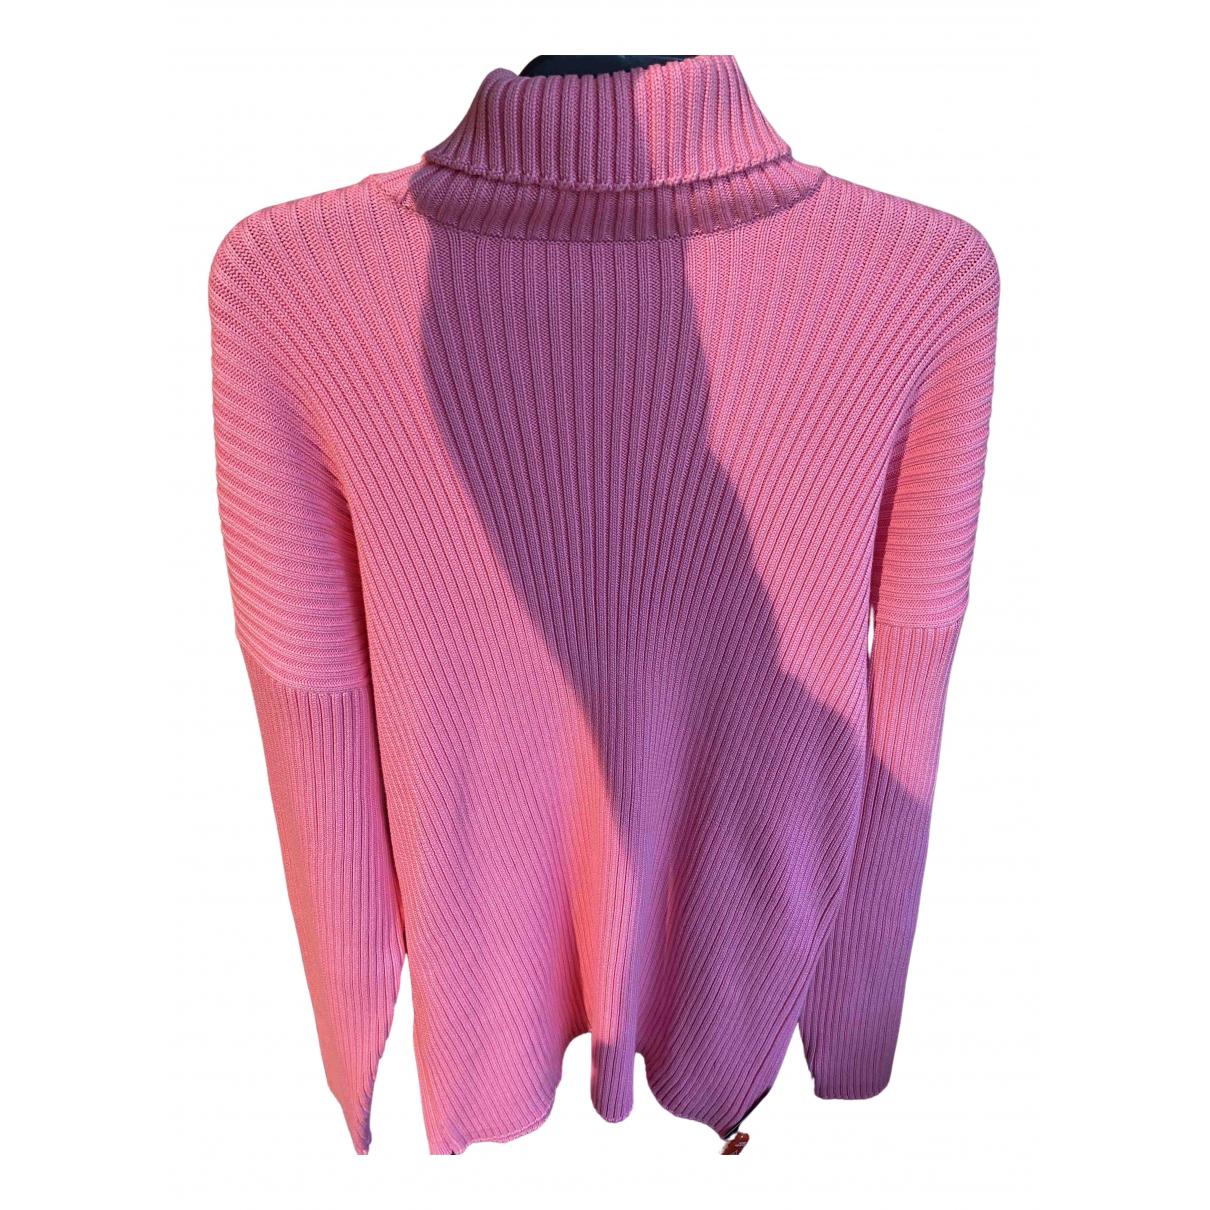 Balenciaga N Pink Cotton Knitwear & Sweatshirts for Men XS International